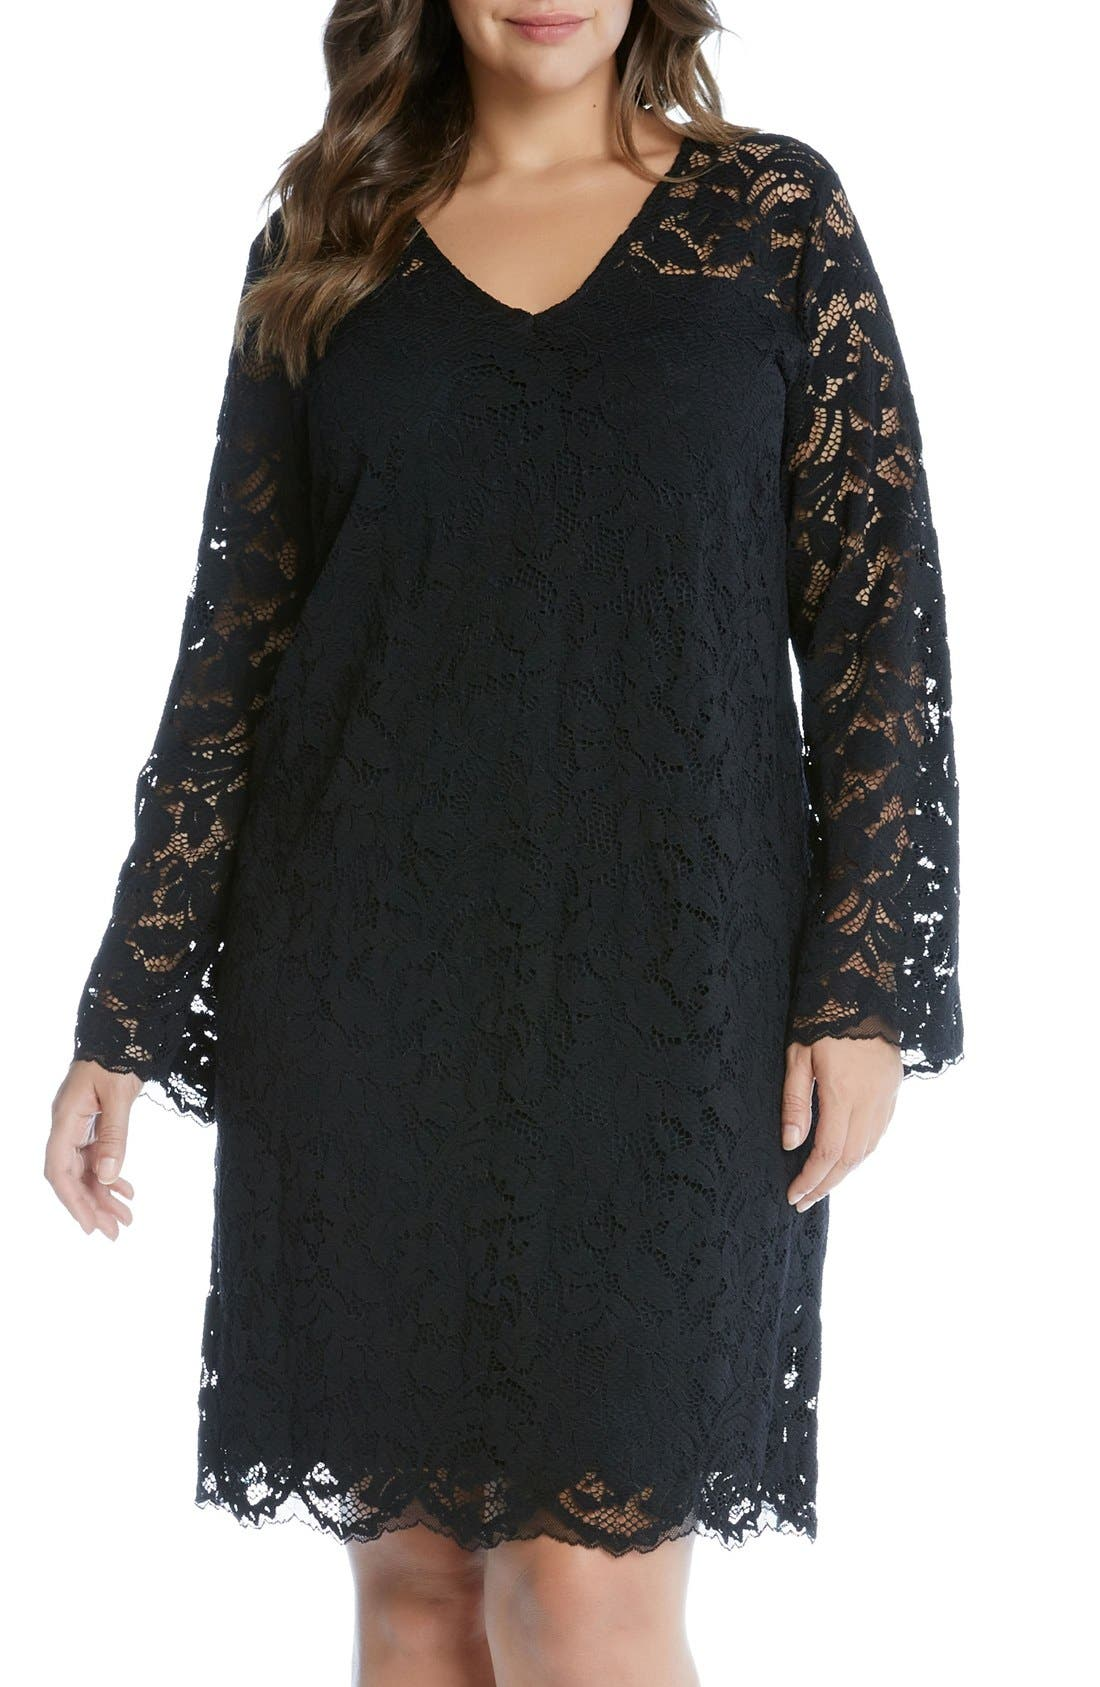 Alternate Image 1 Selected - Karen Kane Lace A-Line Dress (Plus Size)